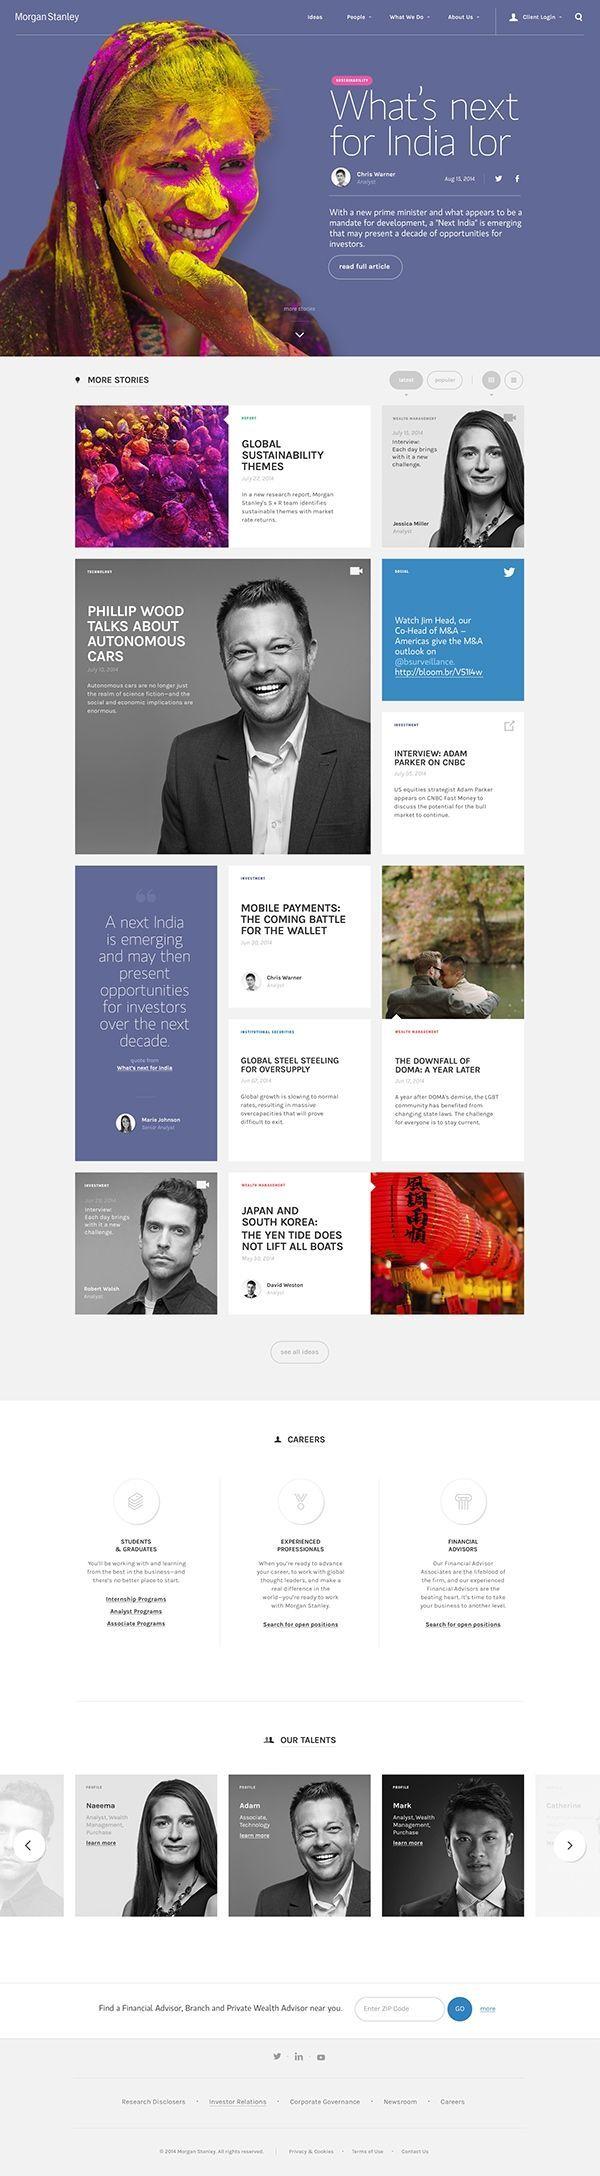 Gallery  Modern   Trendy Web Designs. 17 Best ideas about Web Design Gallery on Pinterest   Web design